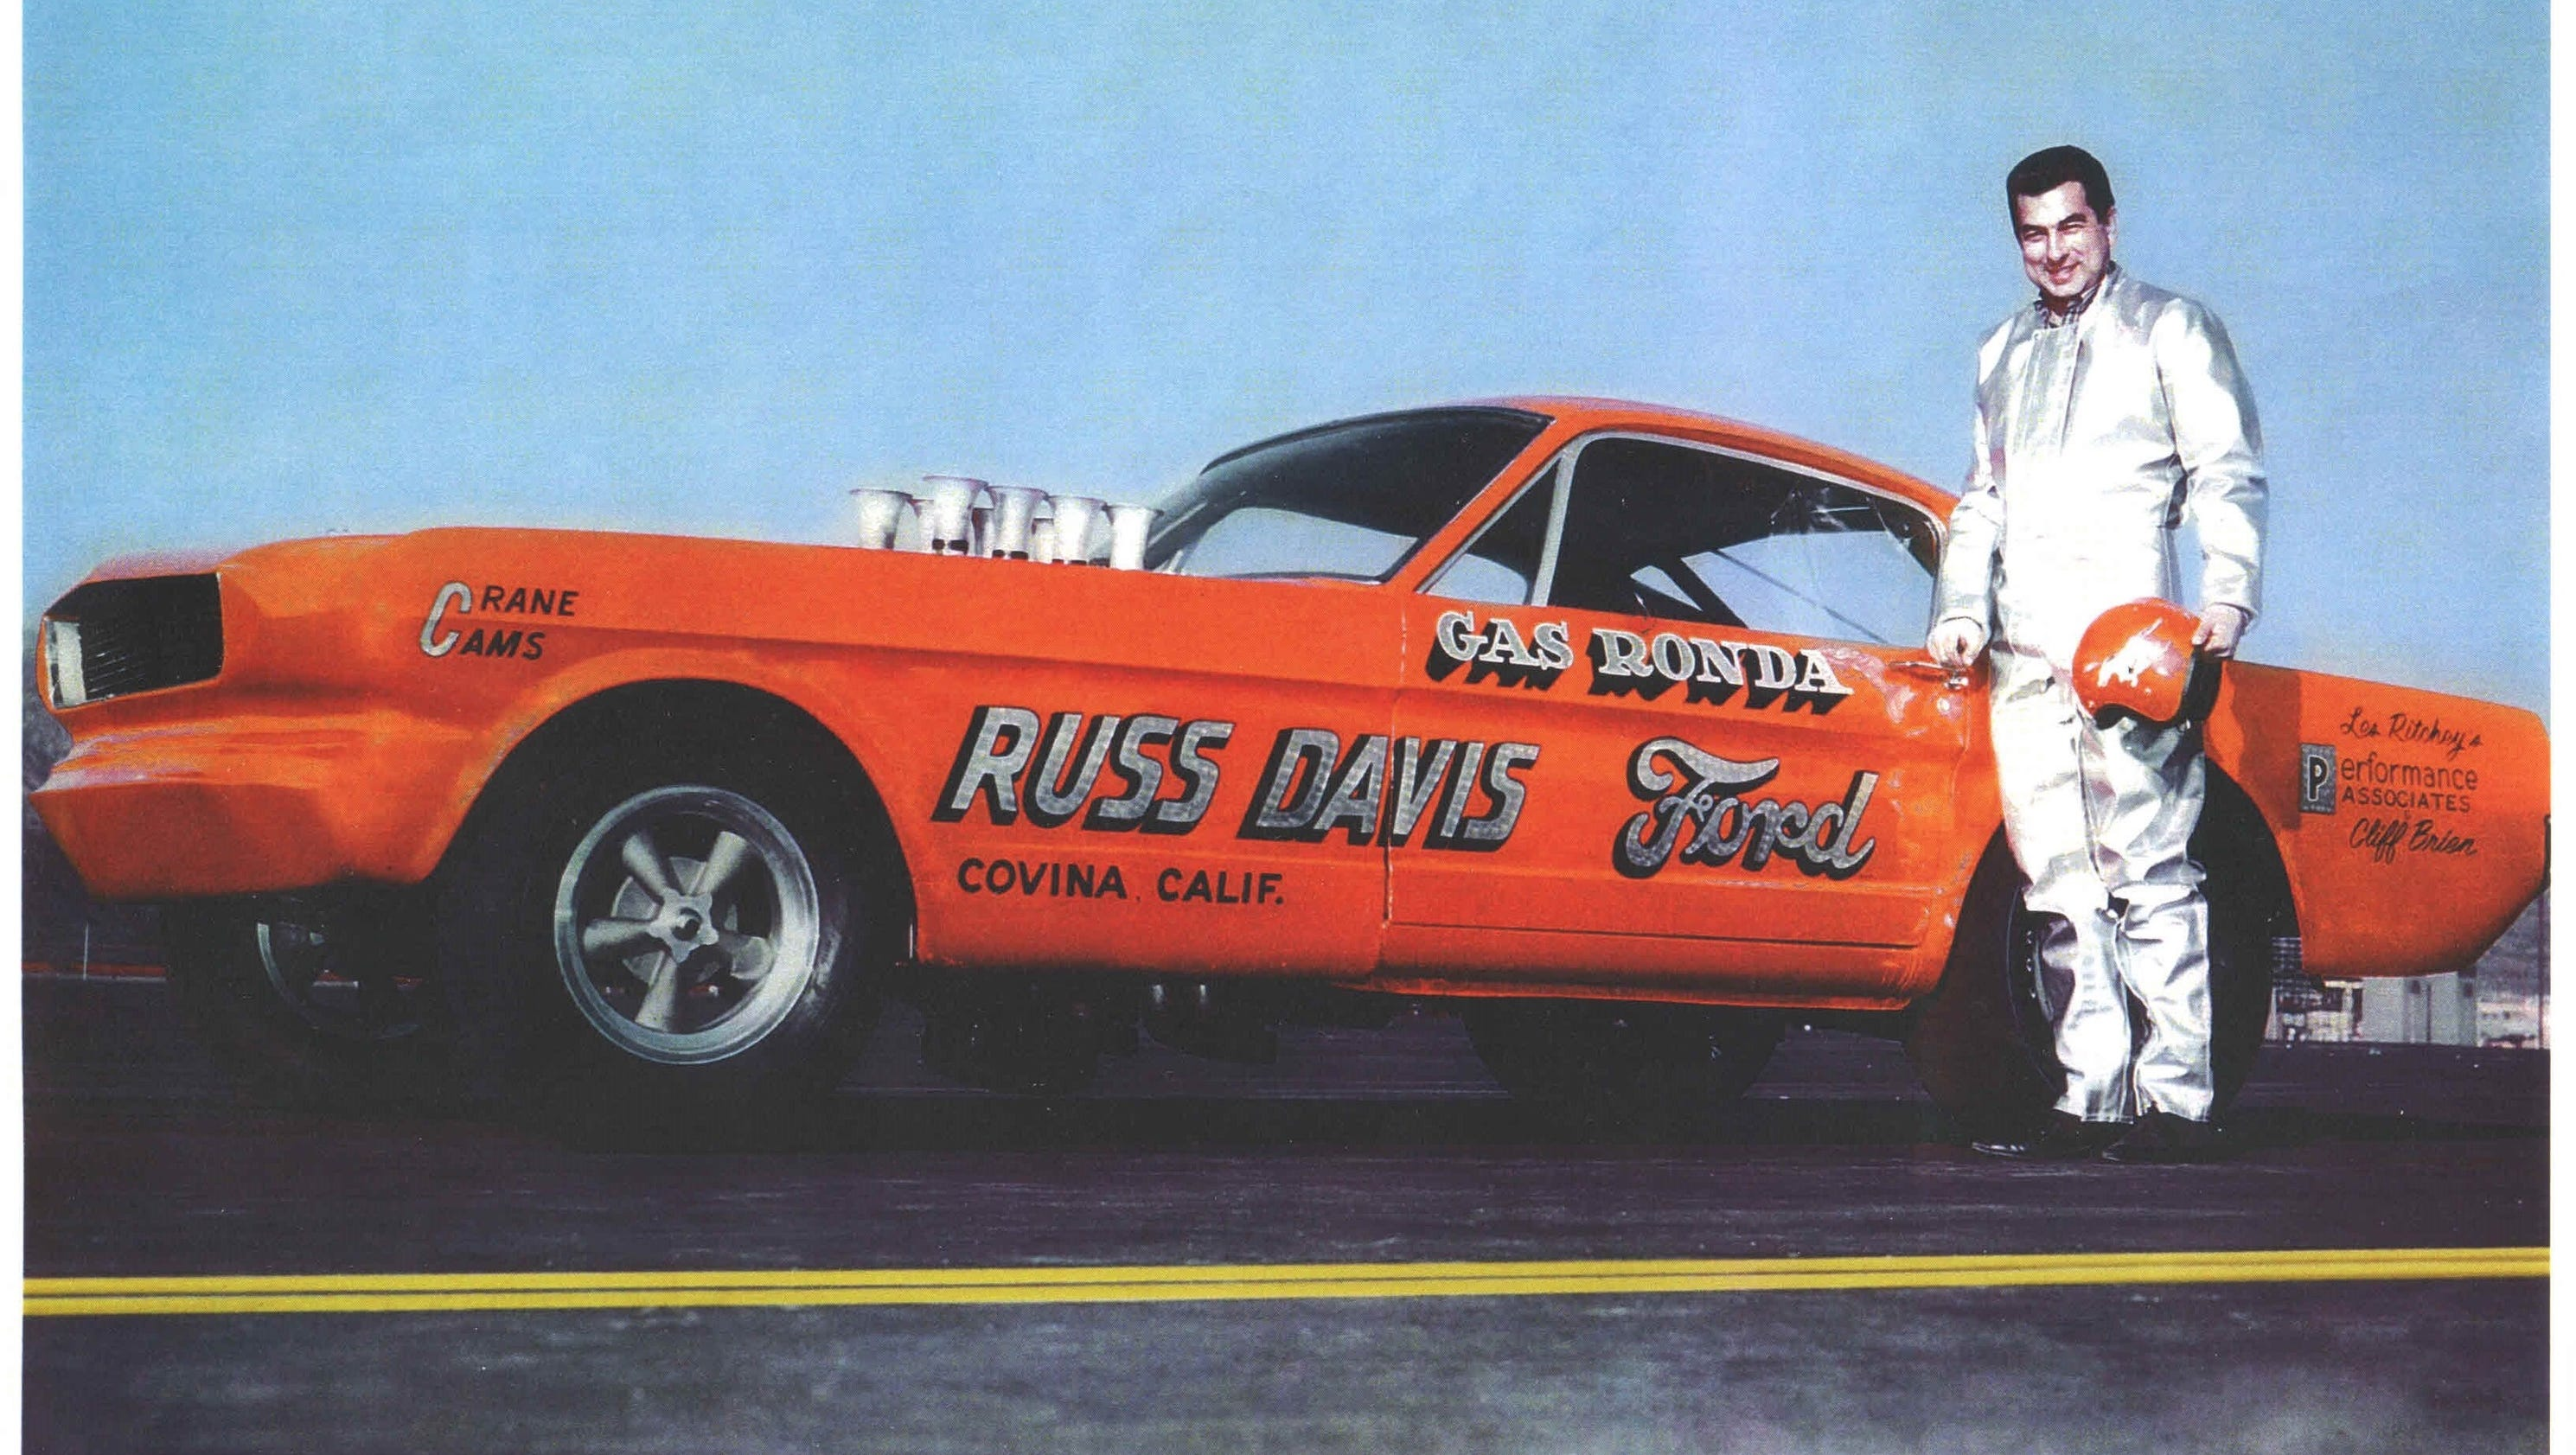 Desert Drag Racer Gas Ronda Gets Into Hall Of Fame